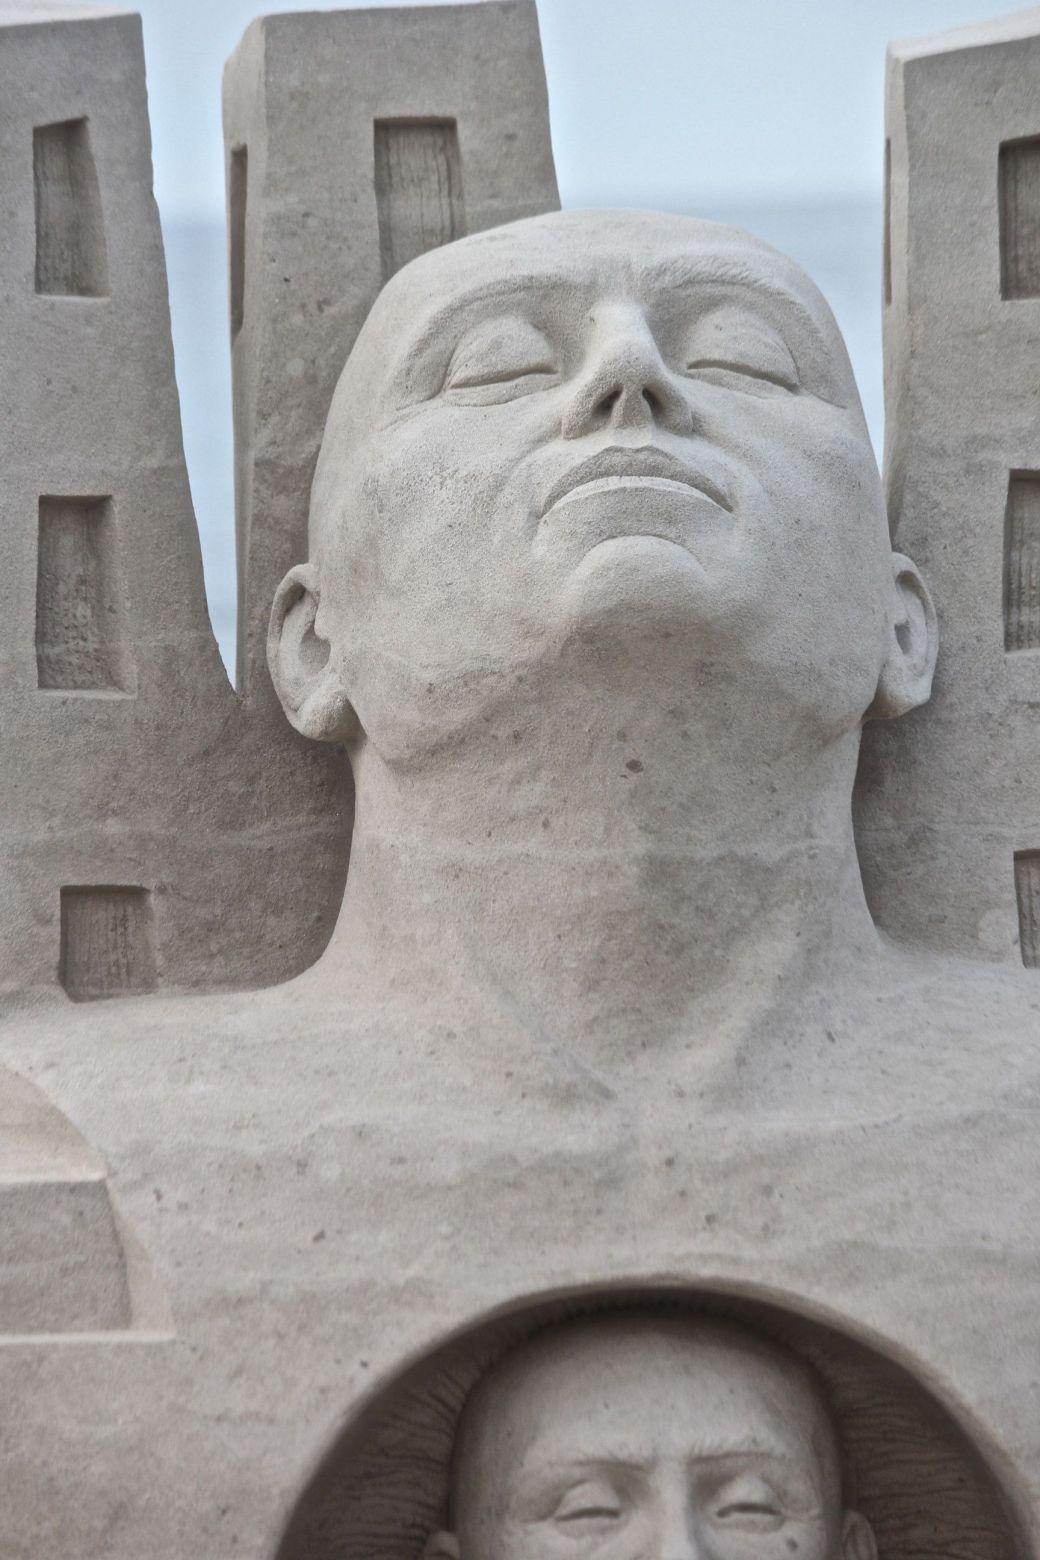 boston revere beach sand sculpture festival heads sculpture head